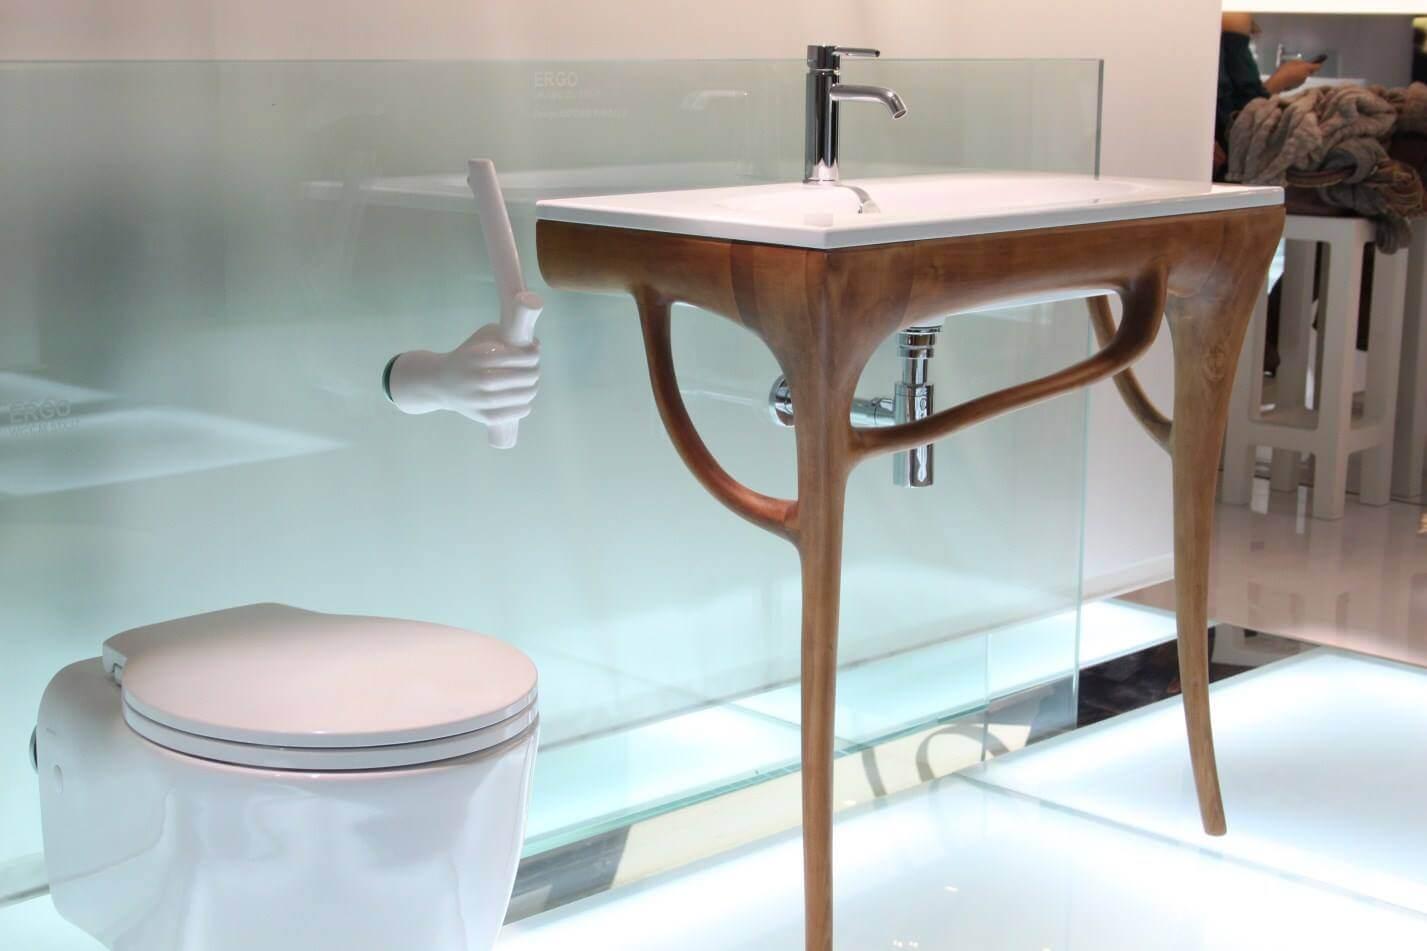 Salone del bagno die größte badezimmermesse der welt